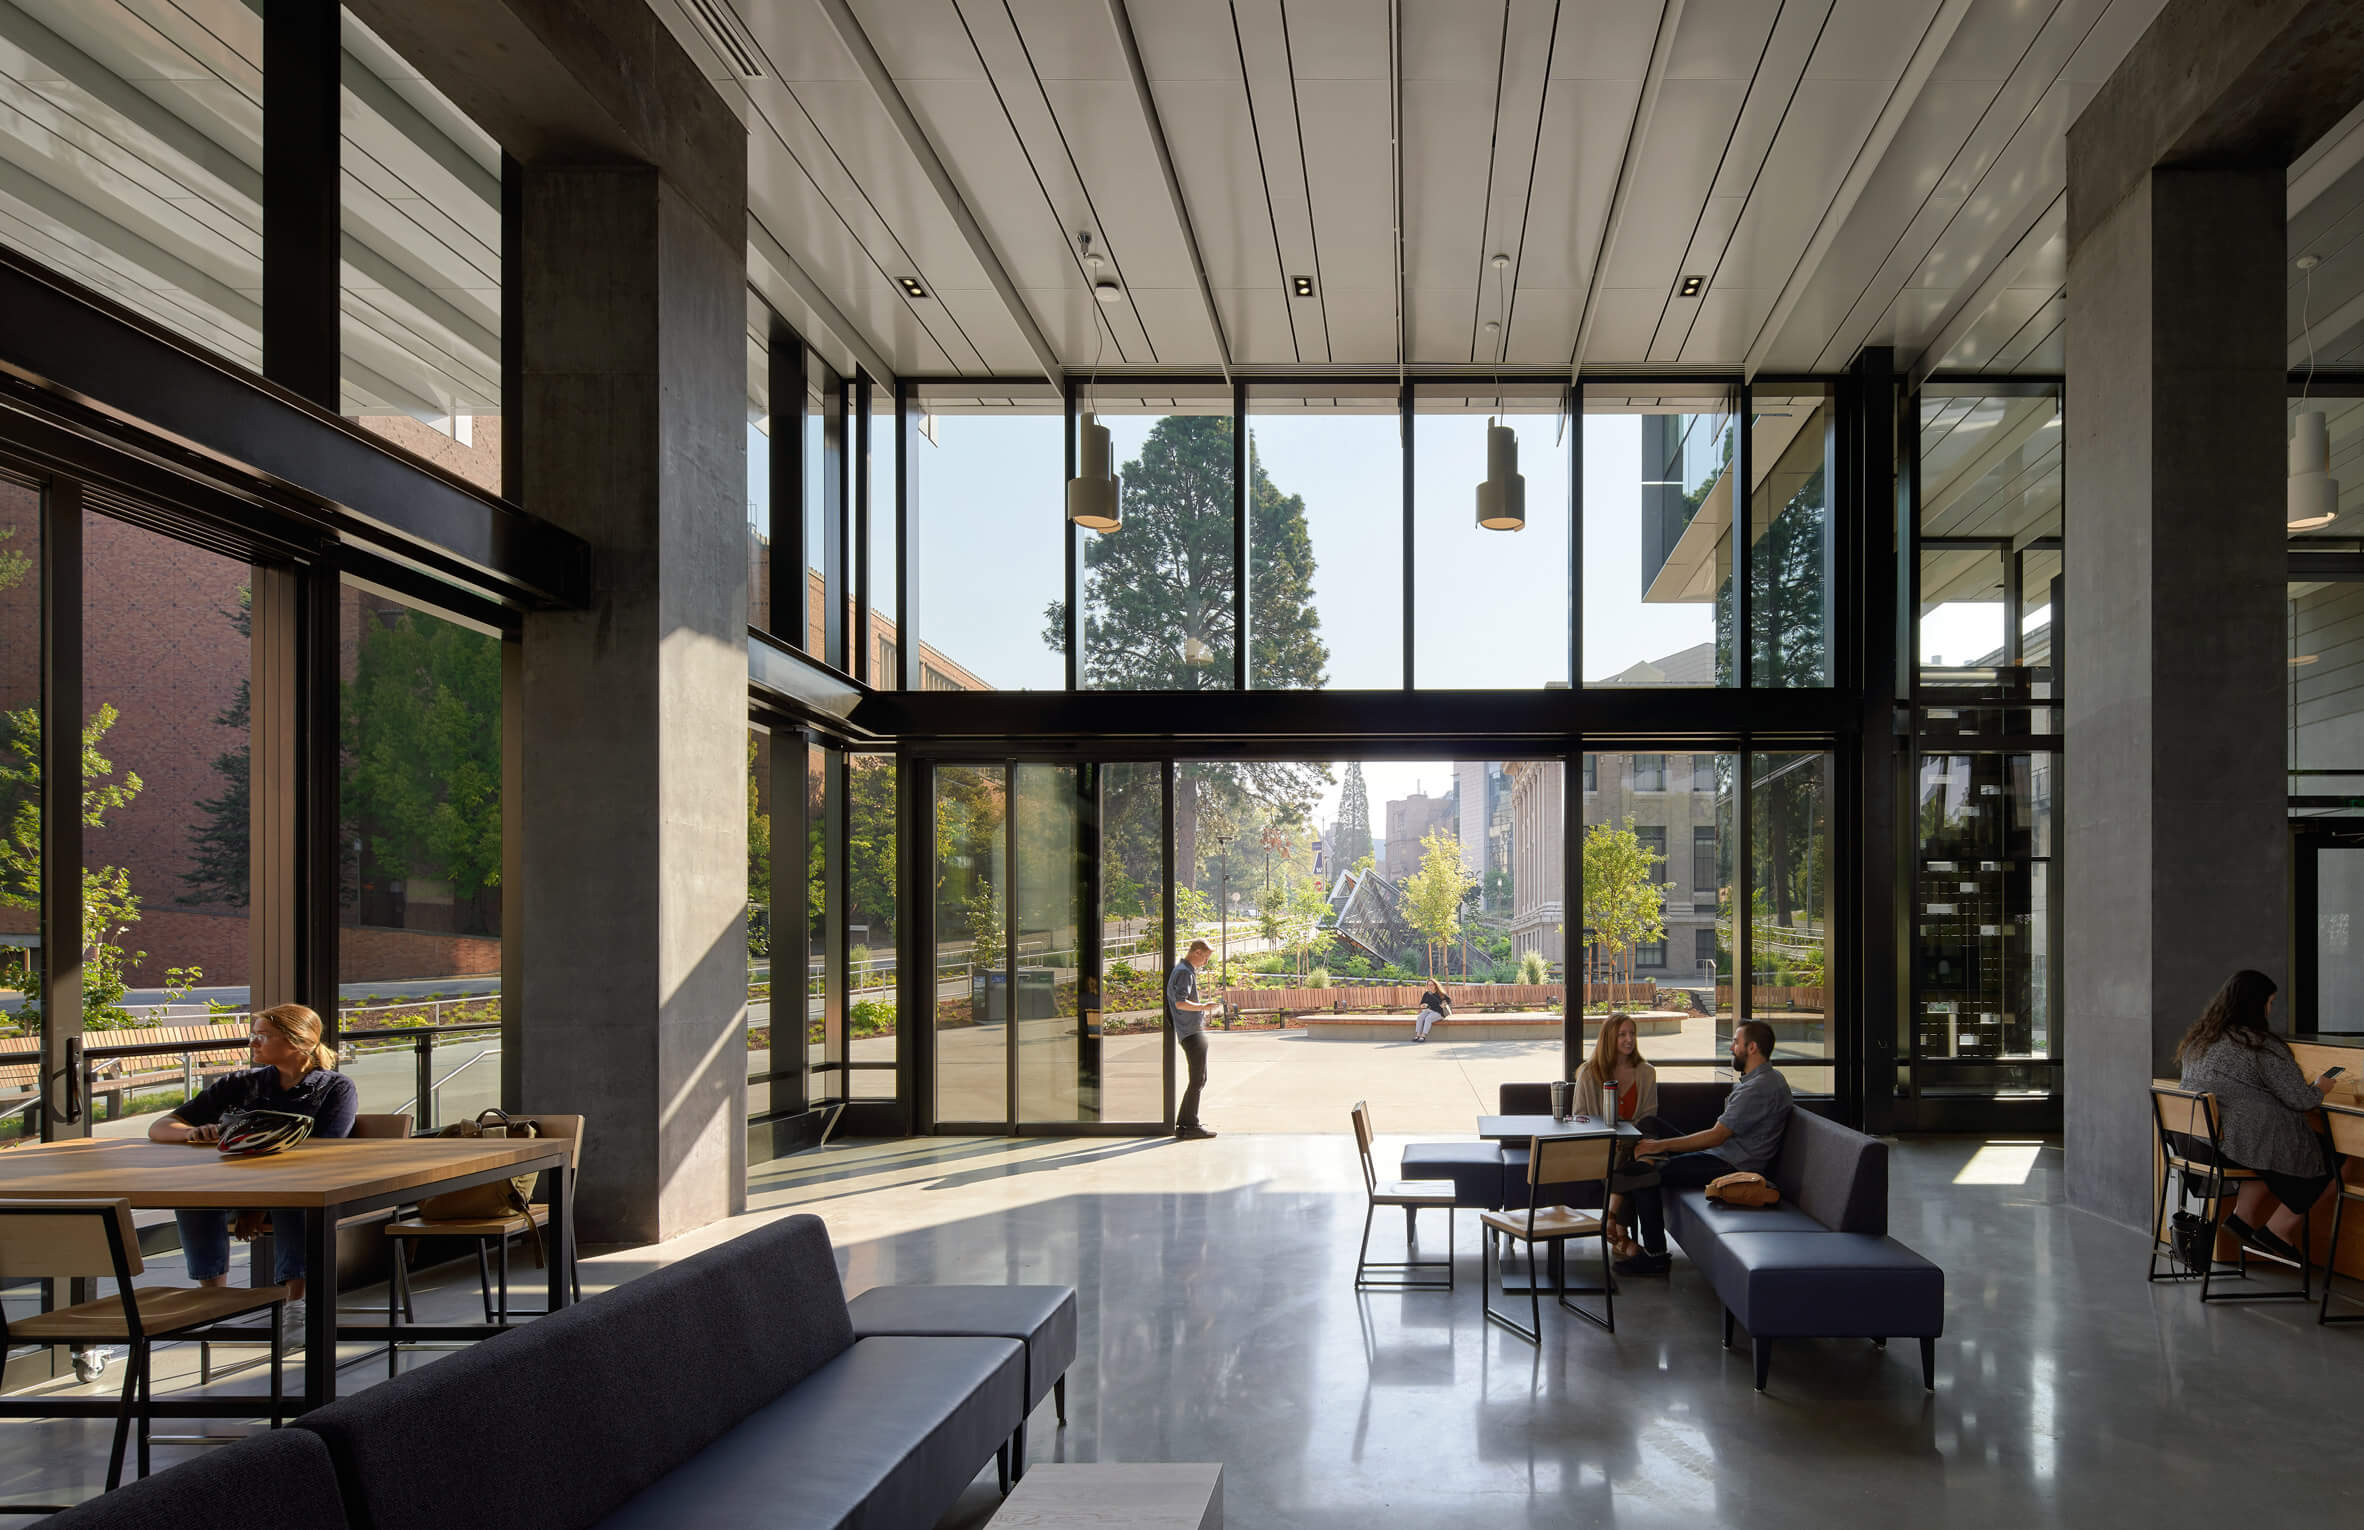 Glazed fins wrap Seattle's Rosling Center by Miller Hull Partnership